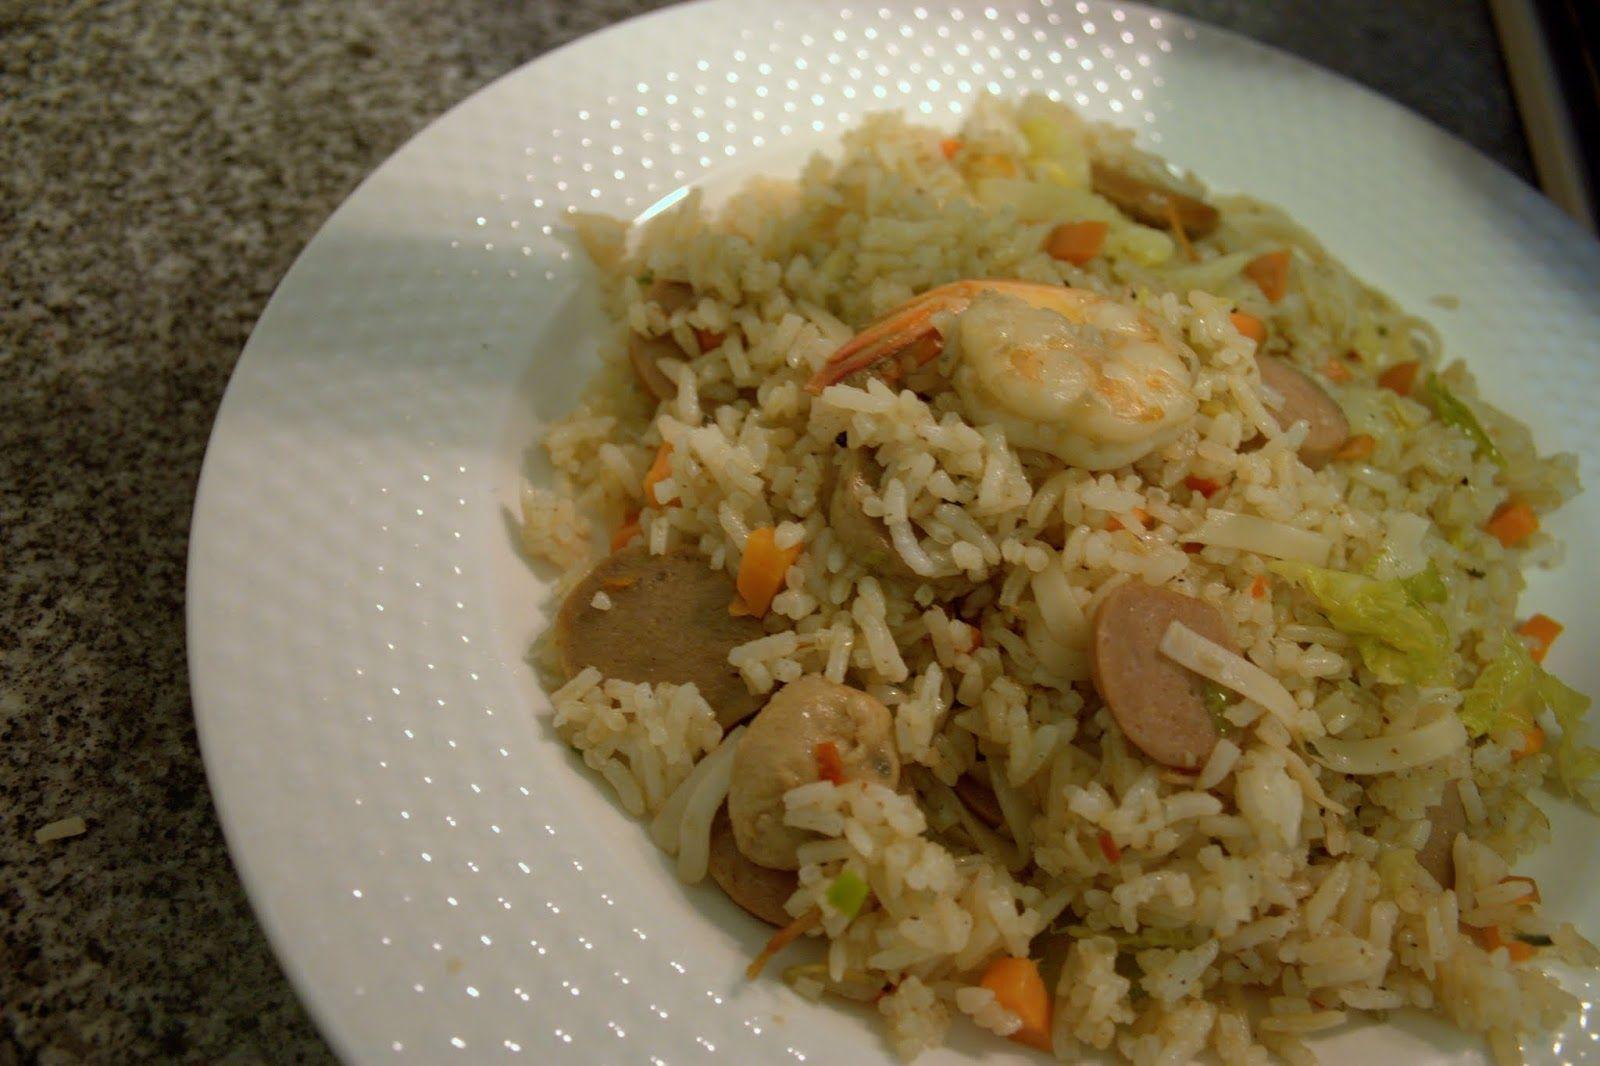 The New Housewife S Kitchen Nasi Goreng Mawut Mixed Fried Rice Resep Masakan Masakan Resep